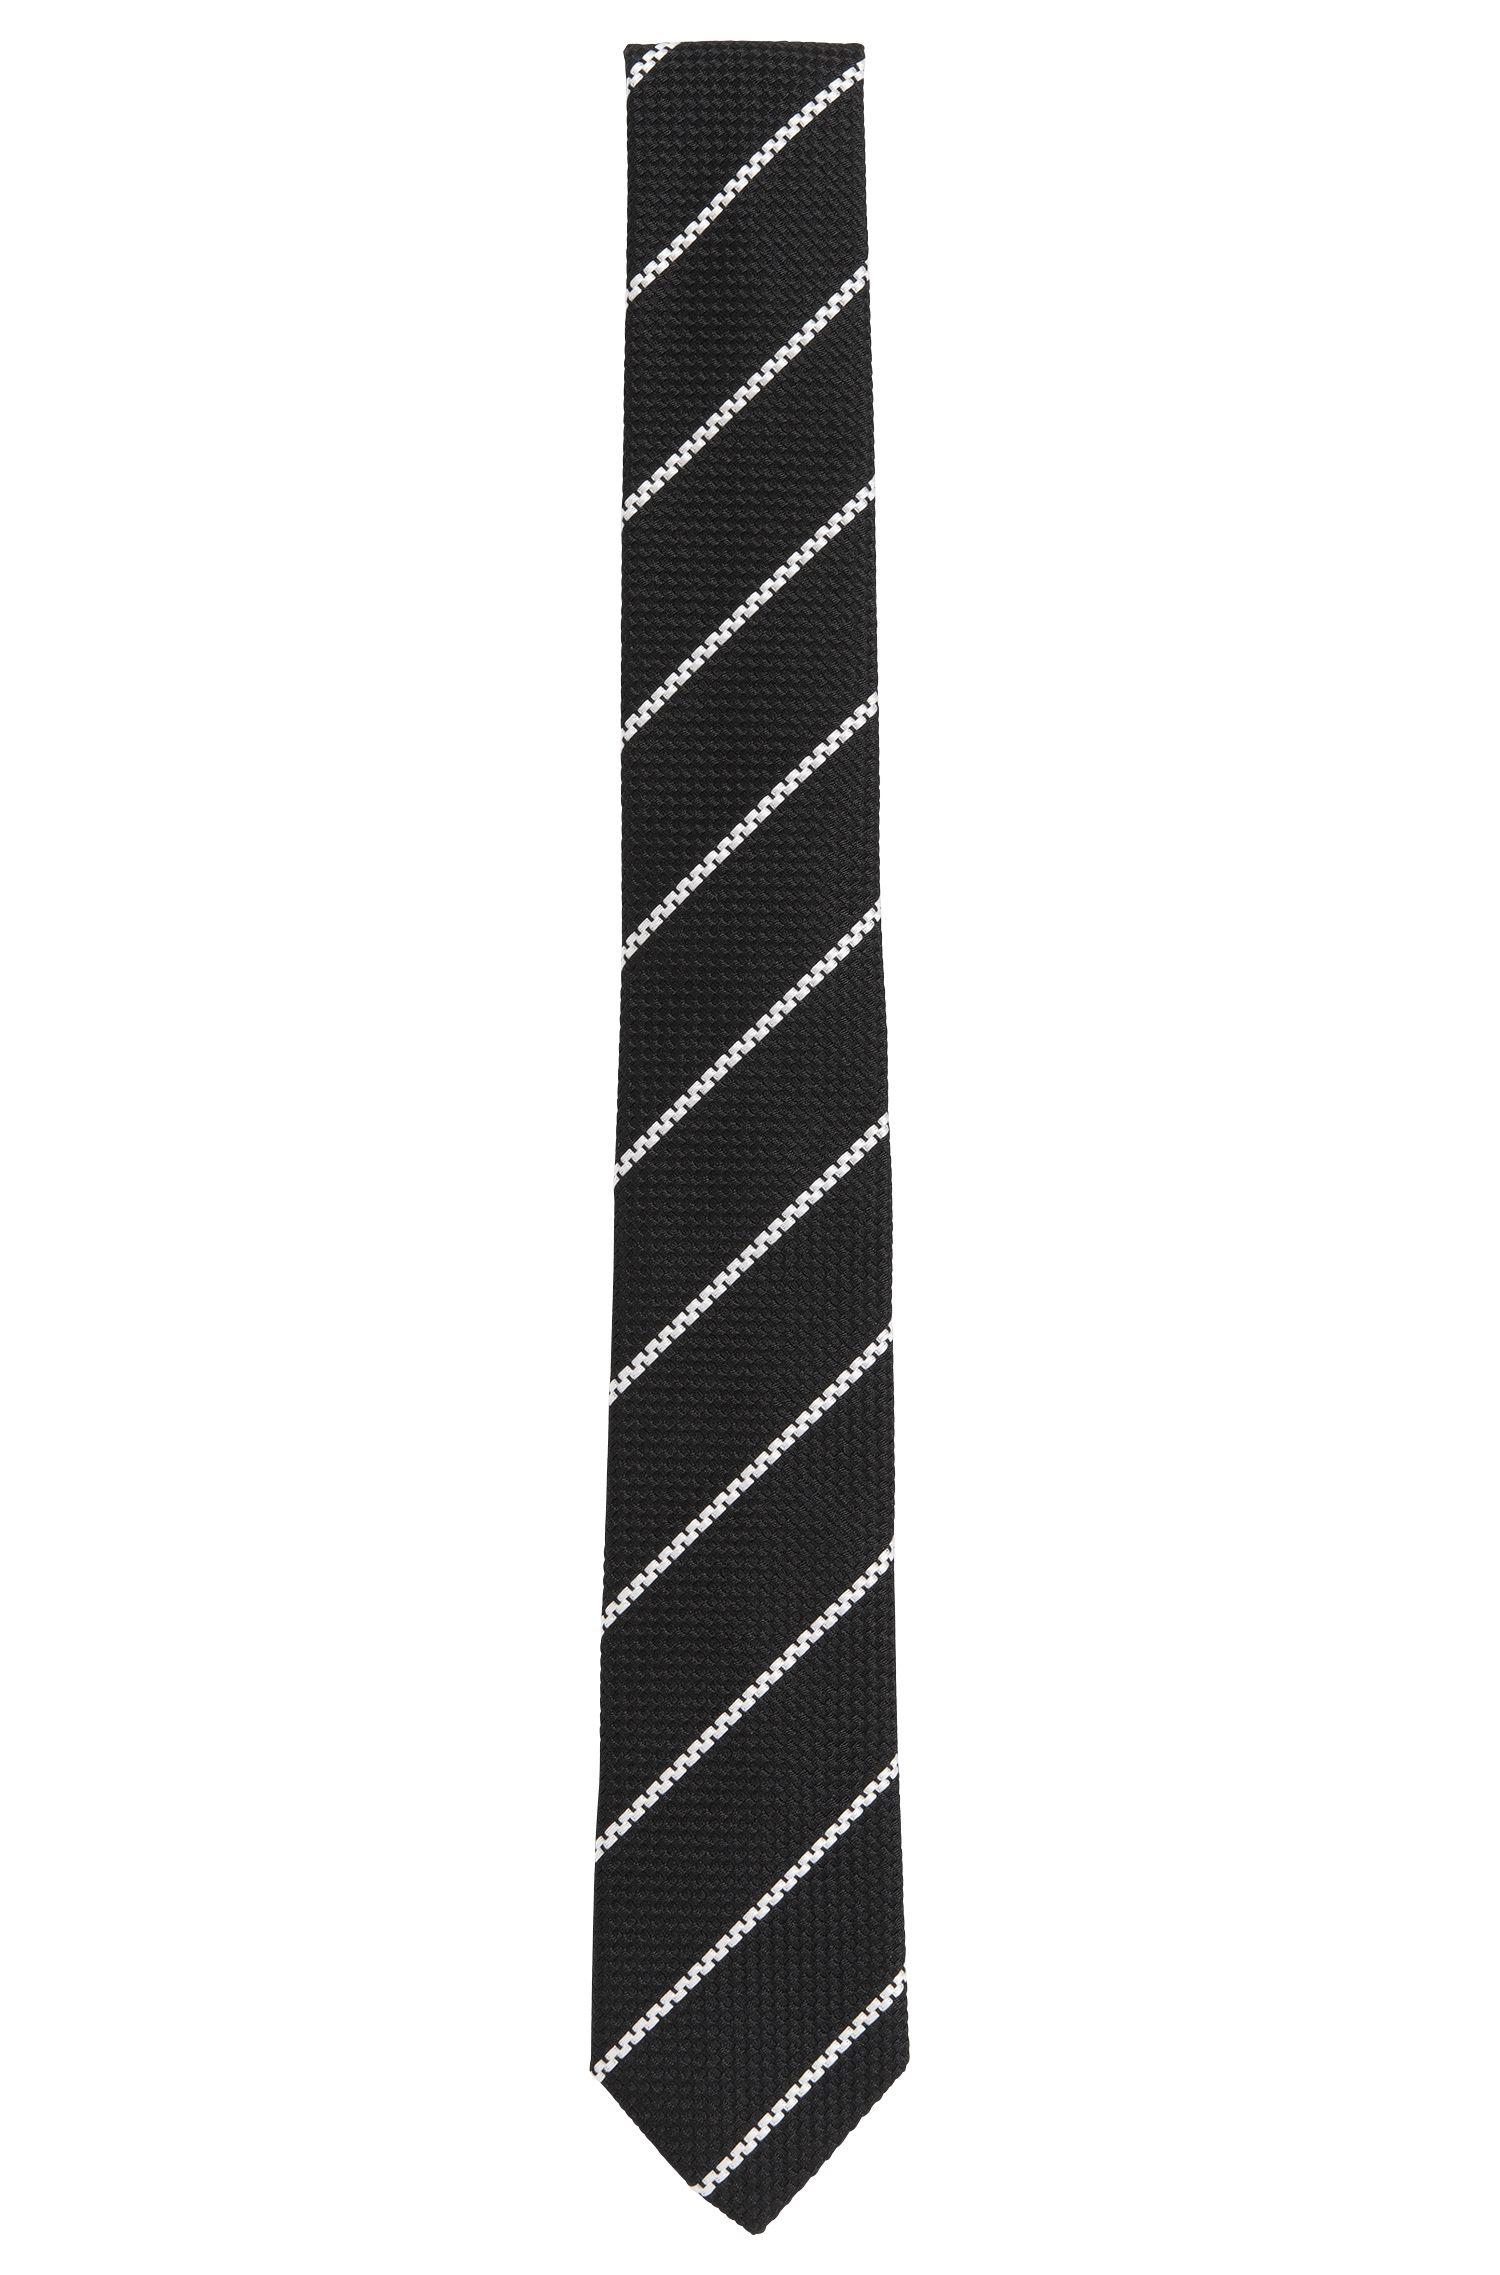 'Tie 6 cm' | Slim, Silk Stripe Tie